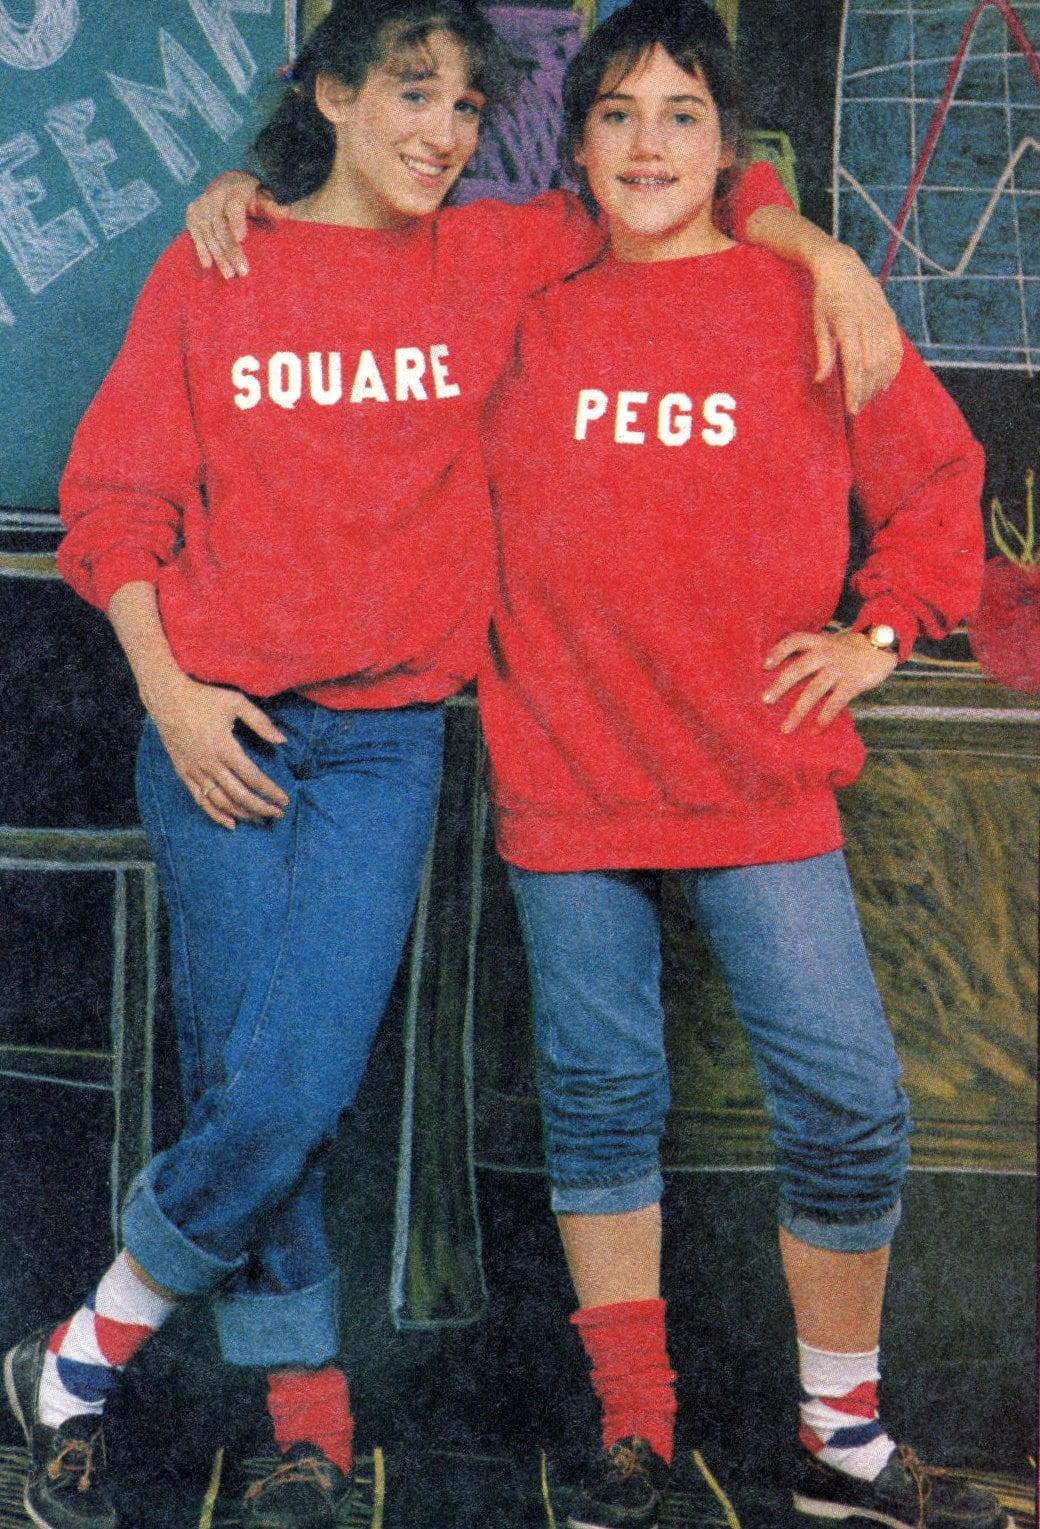 Dynamite 1983 - Square Pegs TV show stars